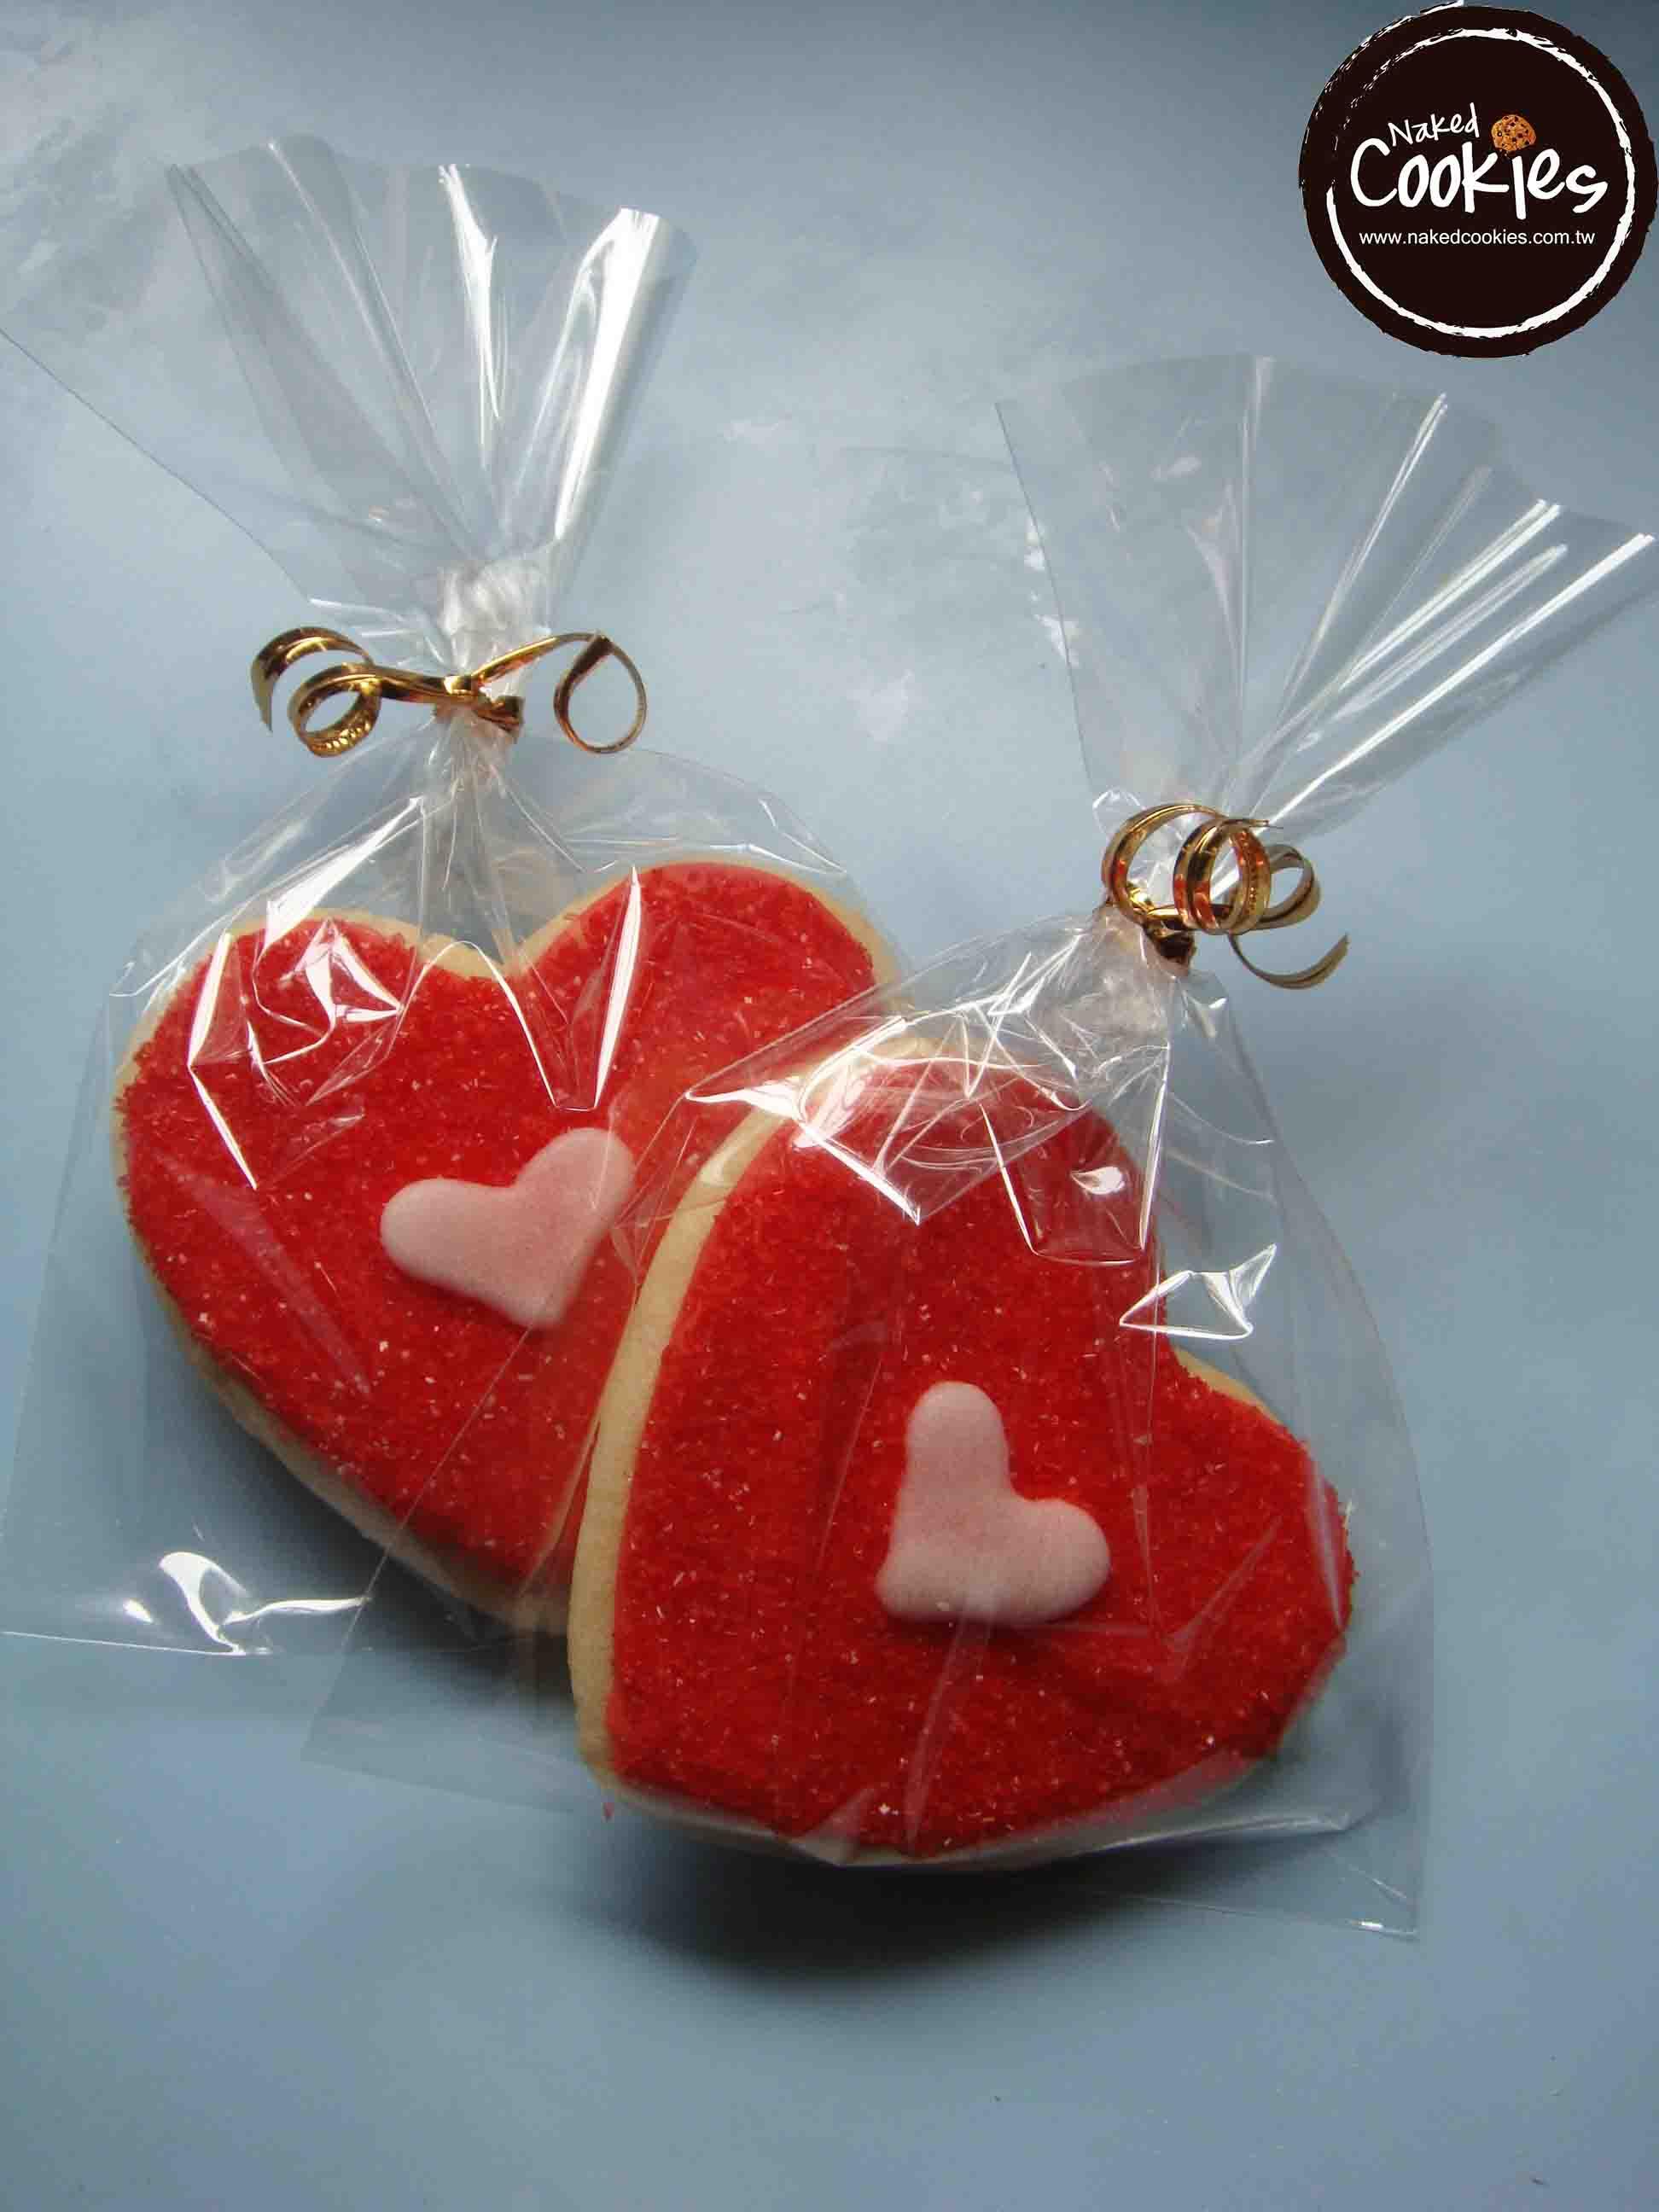 【Naked Cookies】婚禮紅心糖款-創意手工糖霜餅乾,婚禮/生日/活動/收涎/彌月